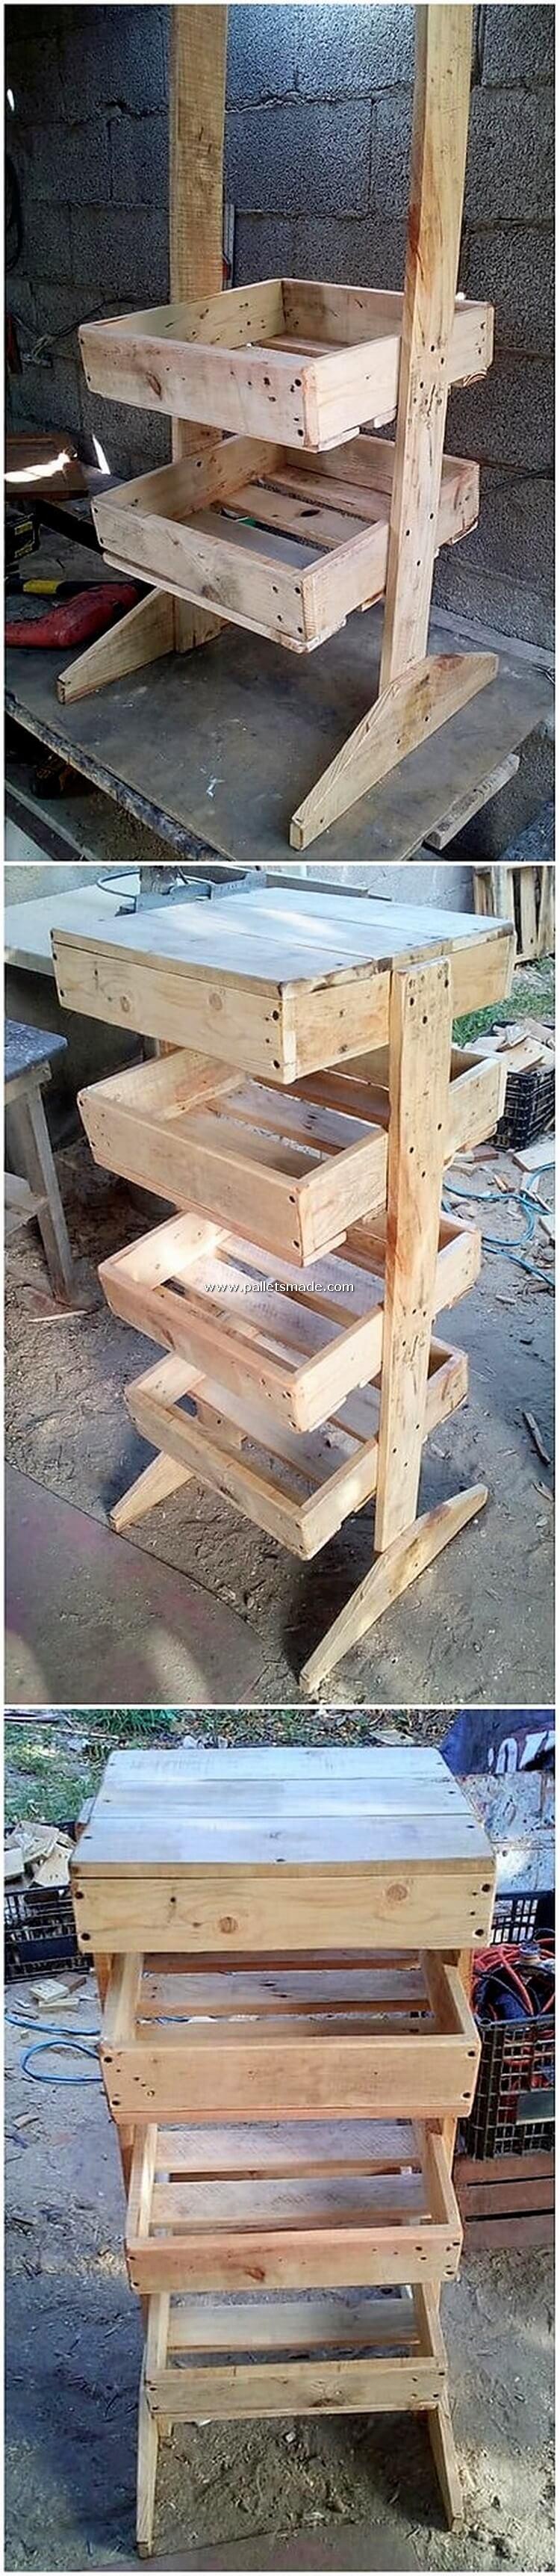 DIY Pallet Shelving Stand